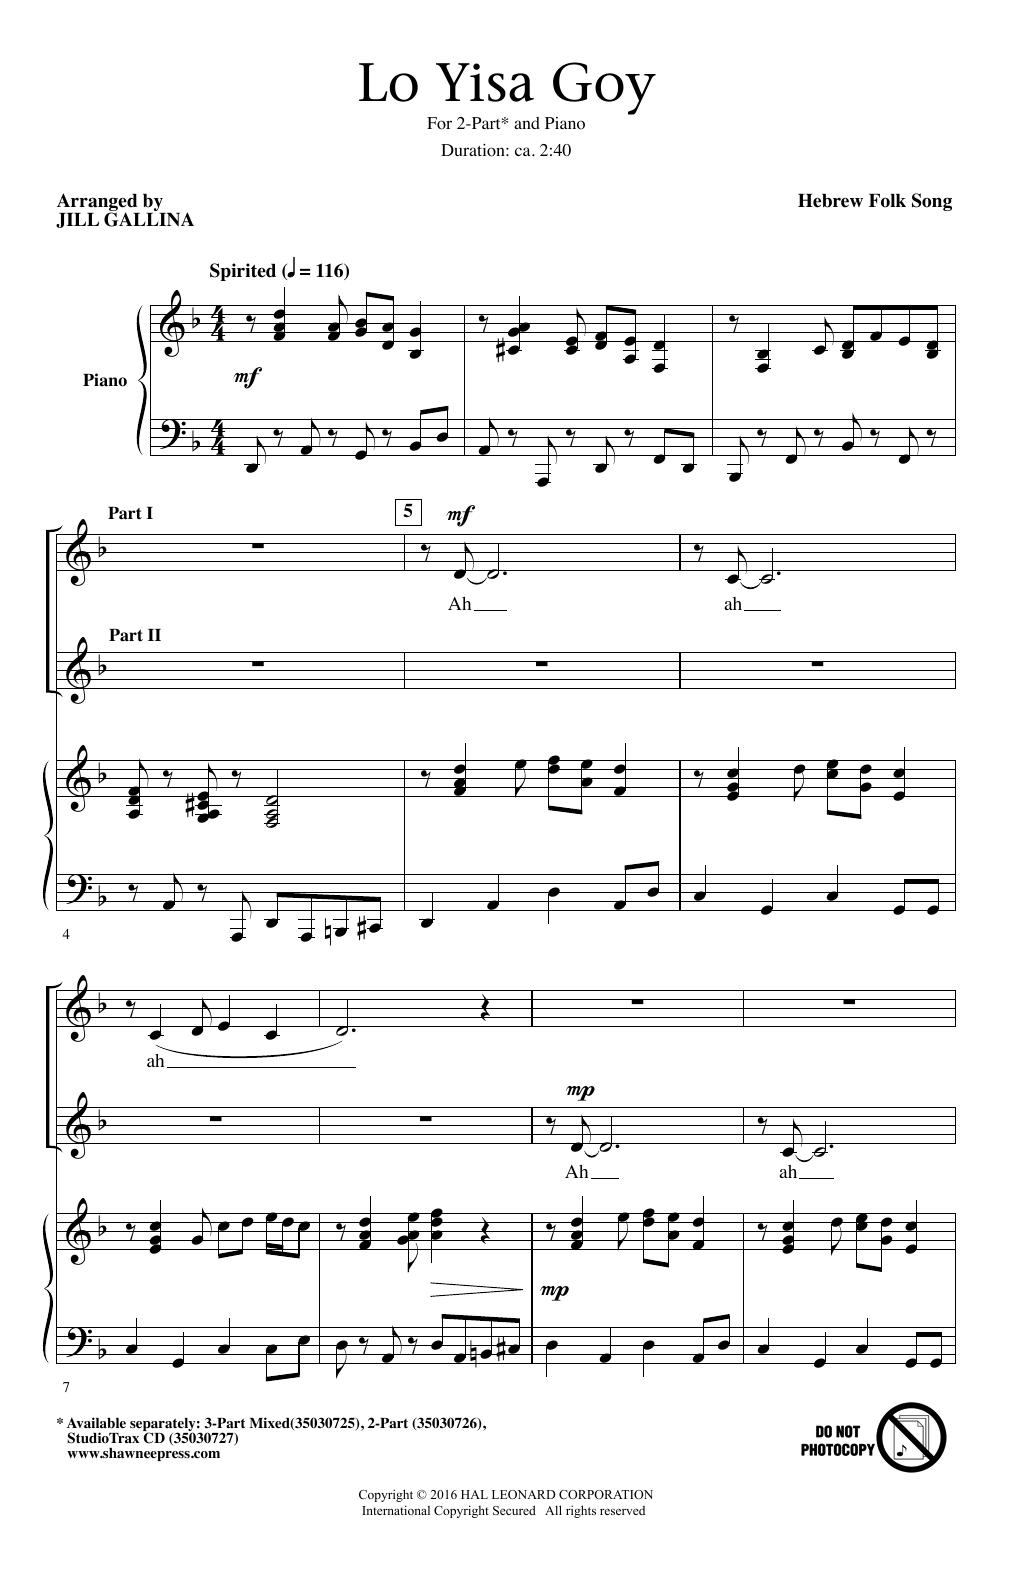 Hebrew Folk Song Lo Yisa Goy (arr. Jill Gallina) sheet music notes and chords. Download Printable PDF.